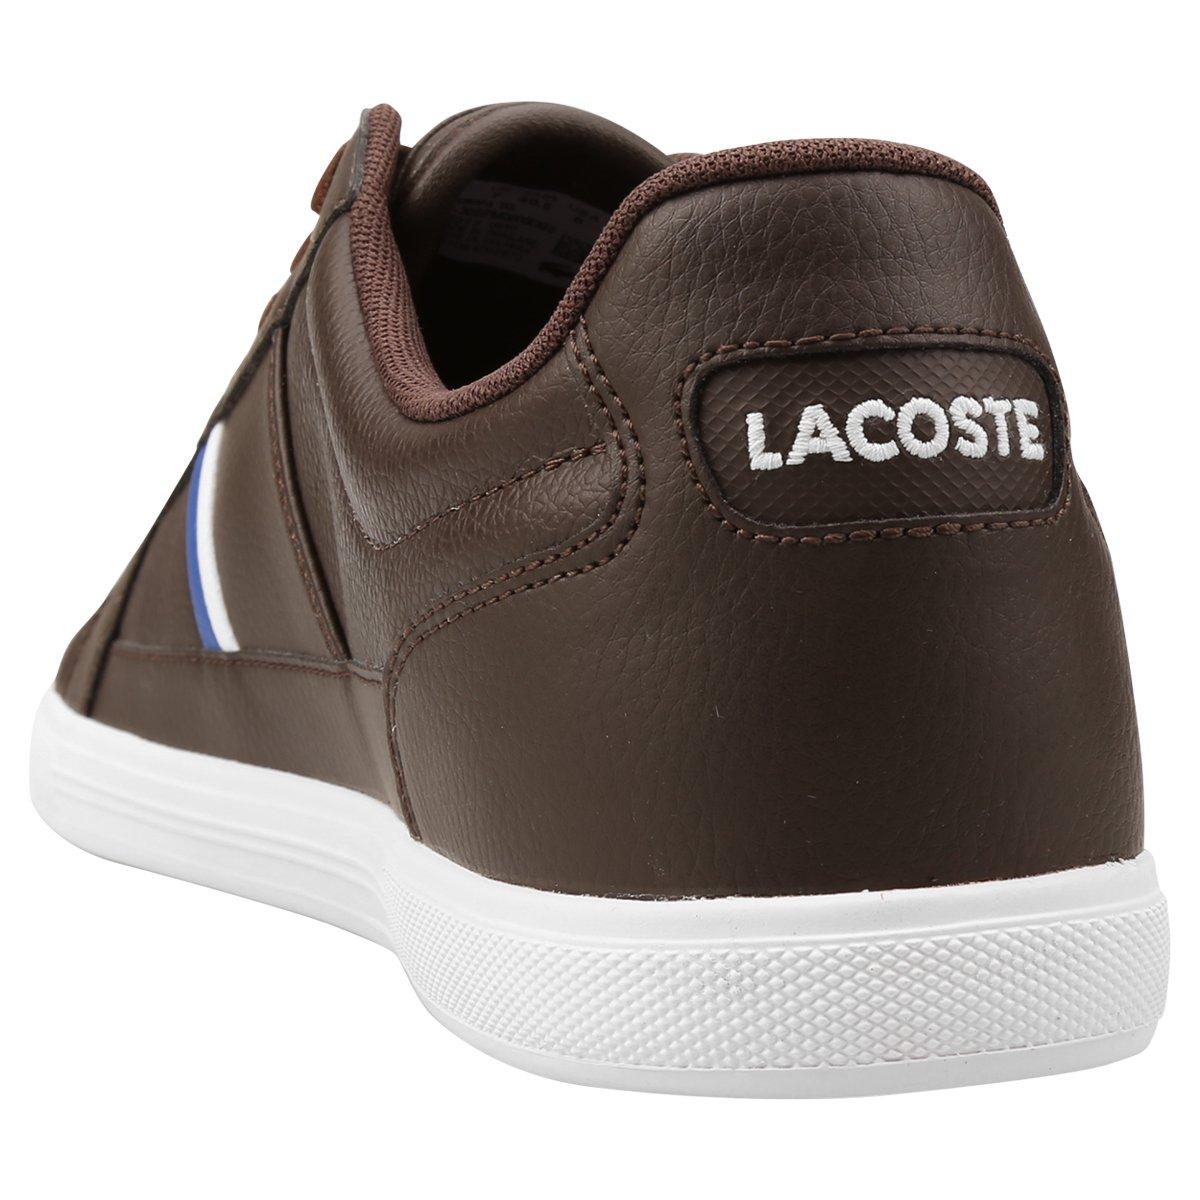 7014ca98f7252 Tênis Lacoste Europa TCL - Compre Agora   Netshoes